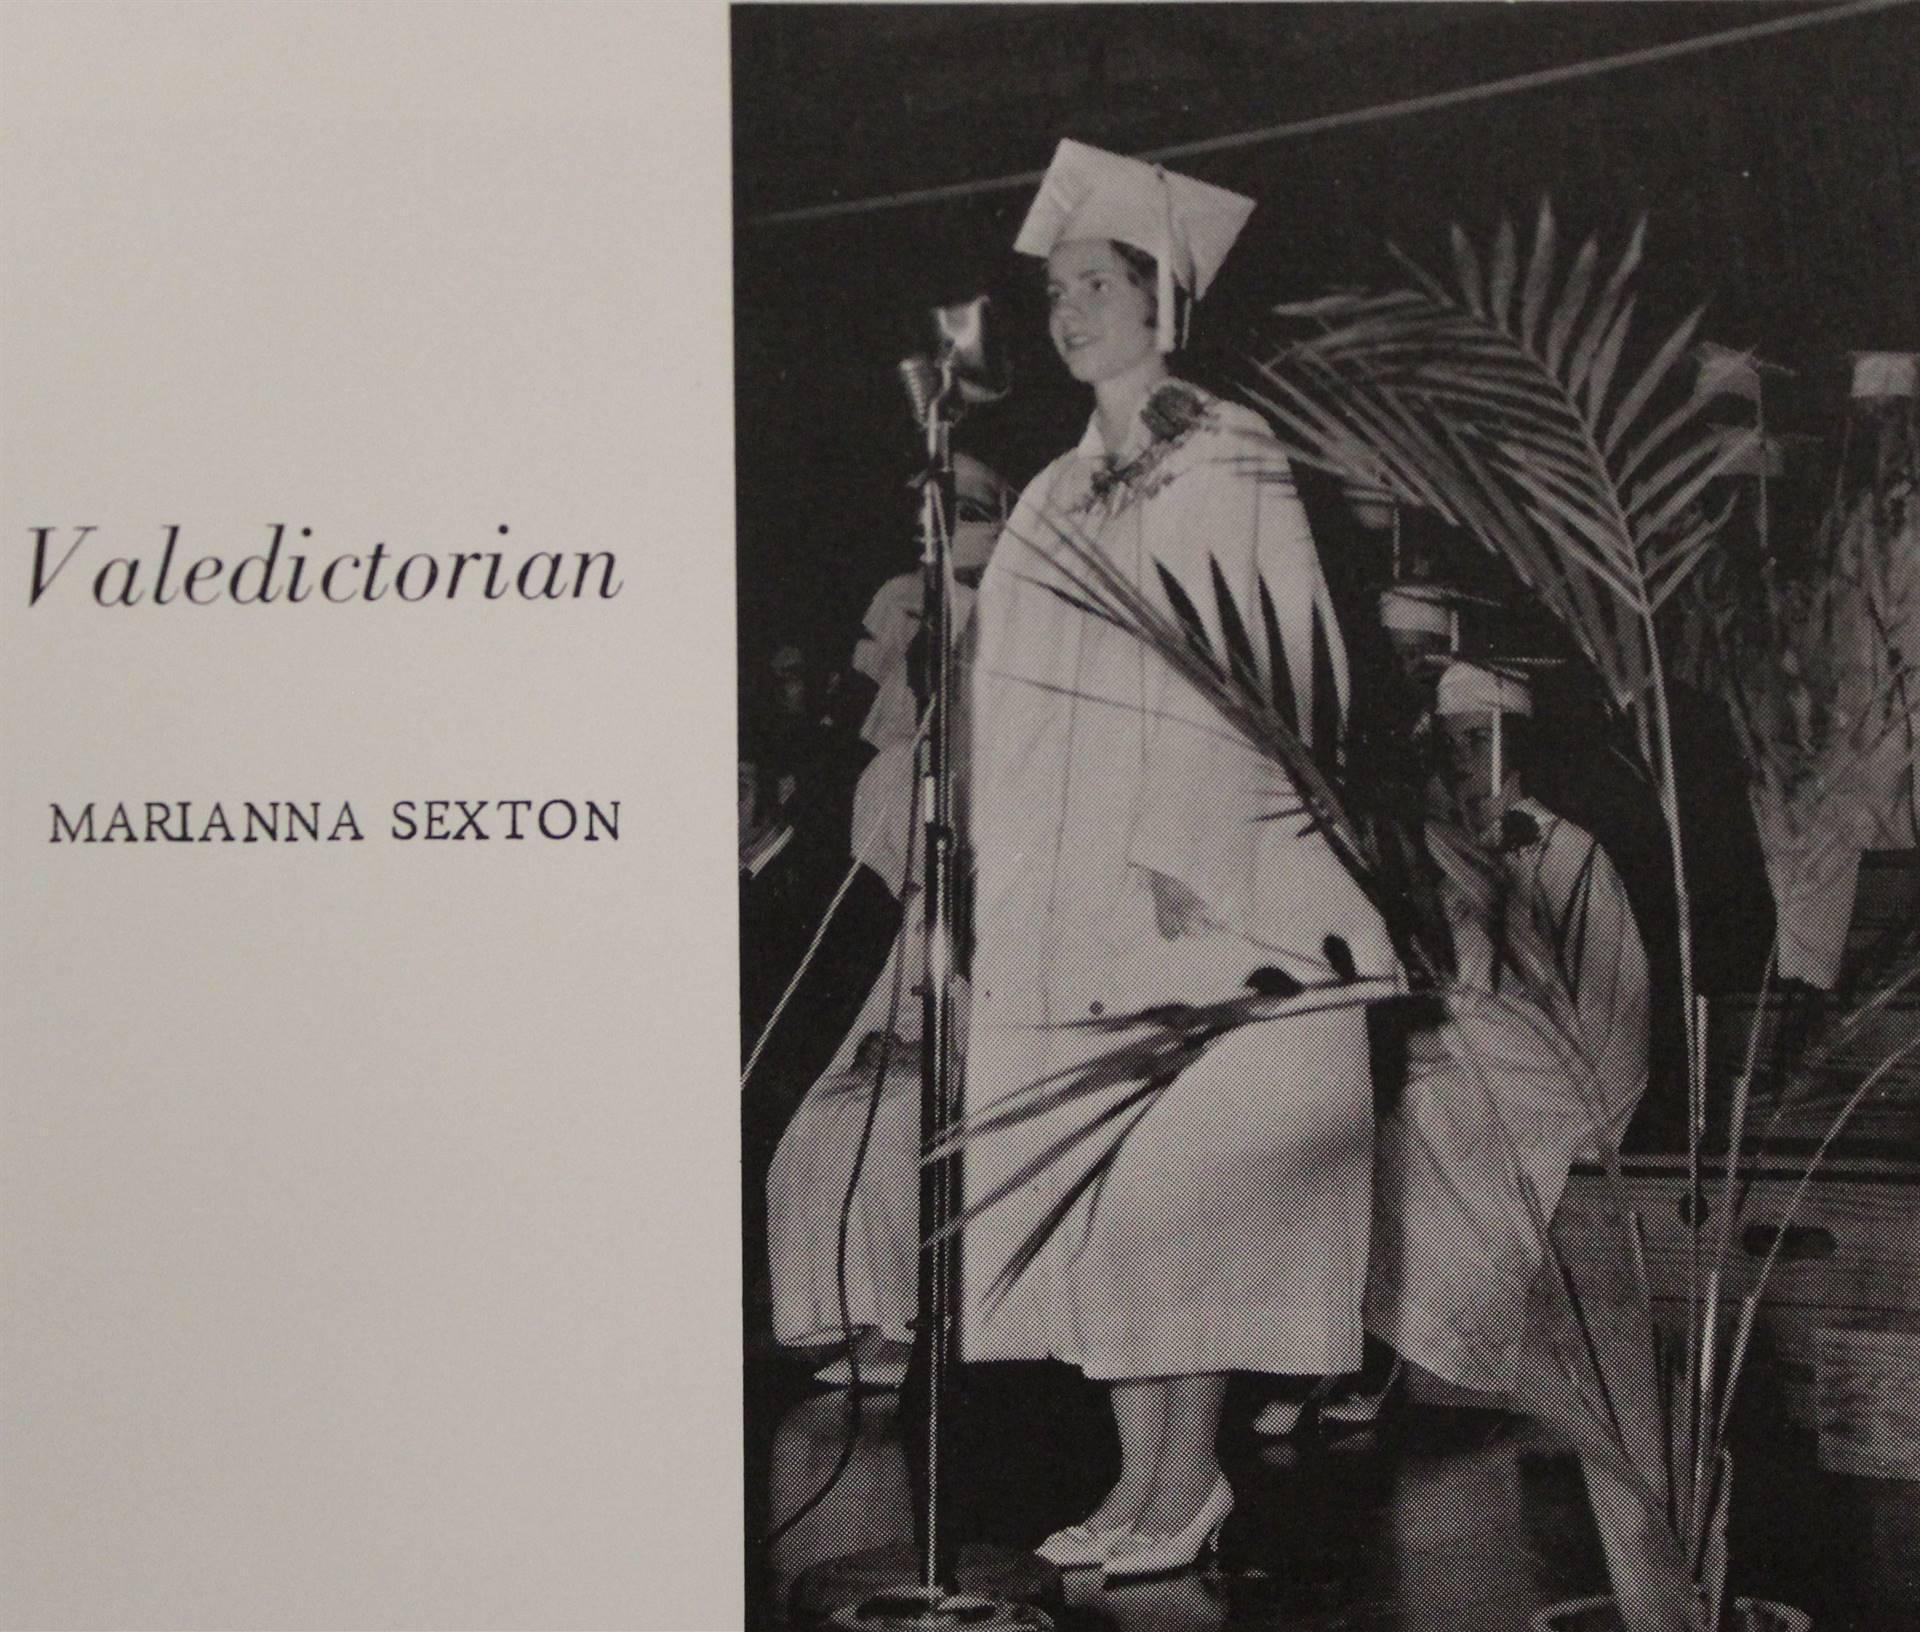 1963 Valedictorian